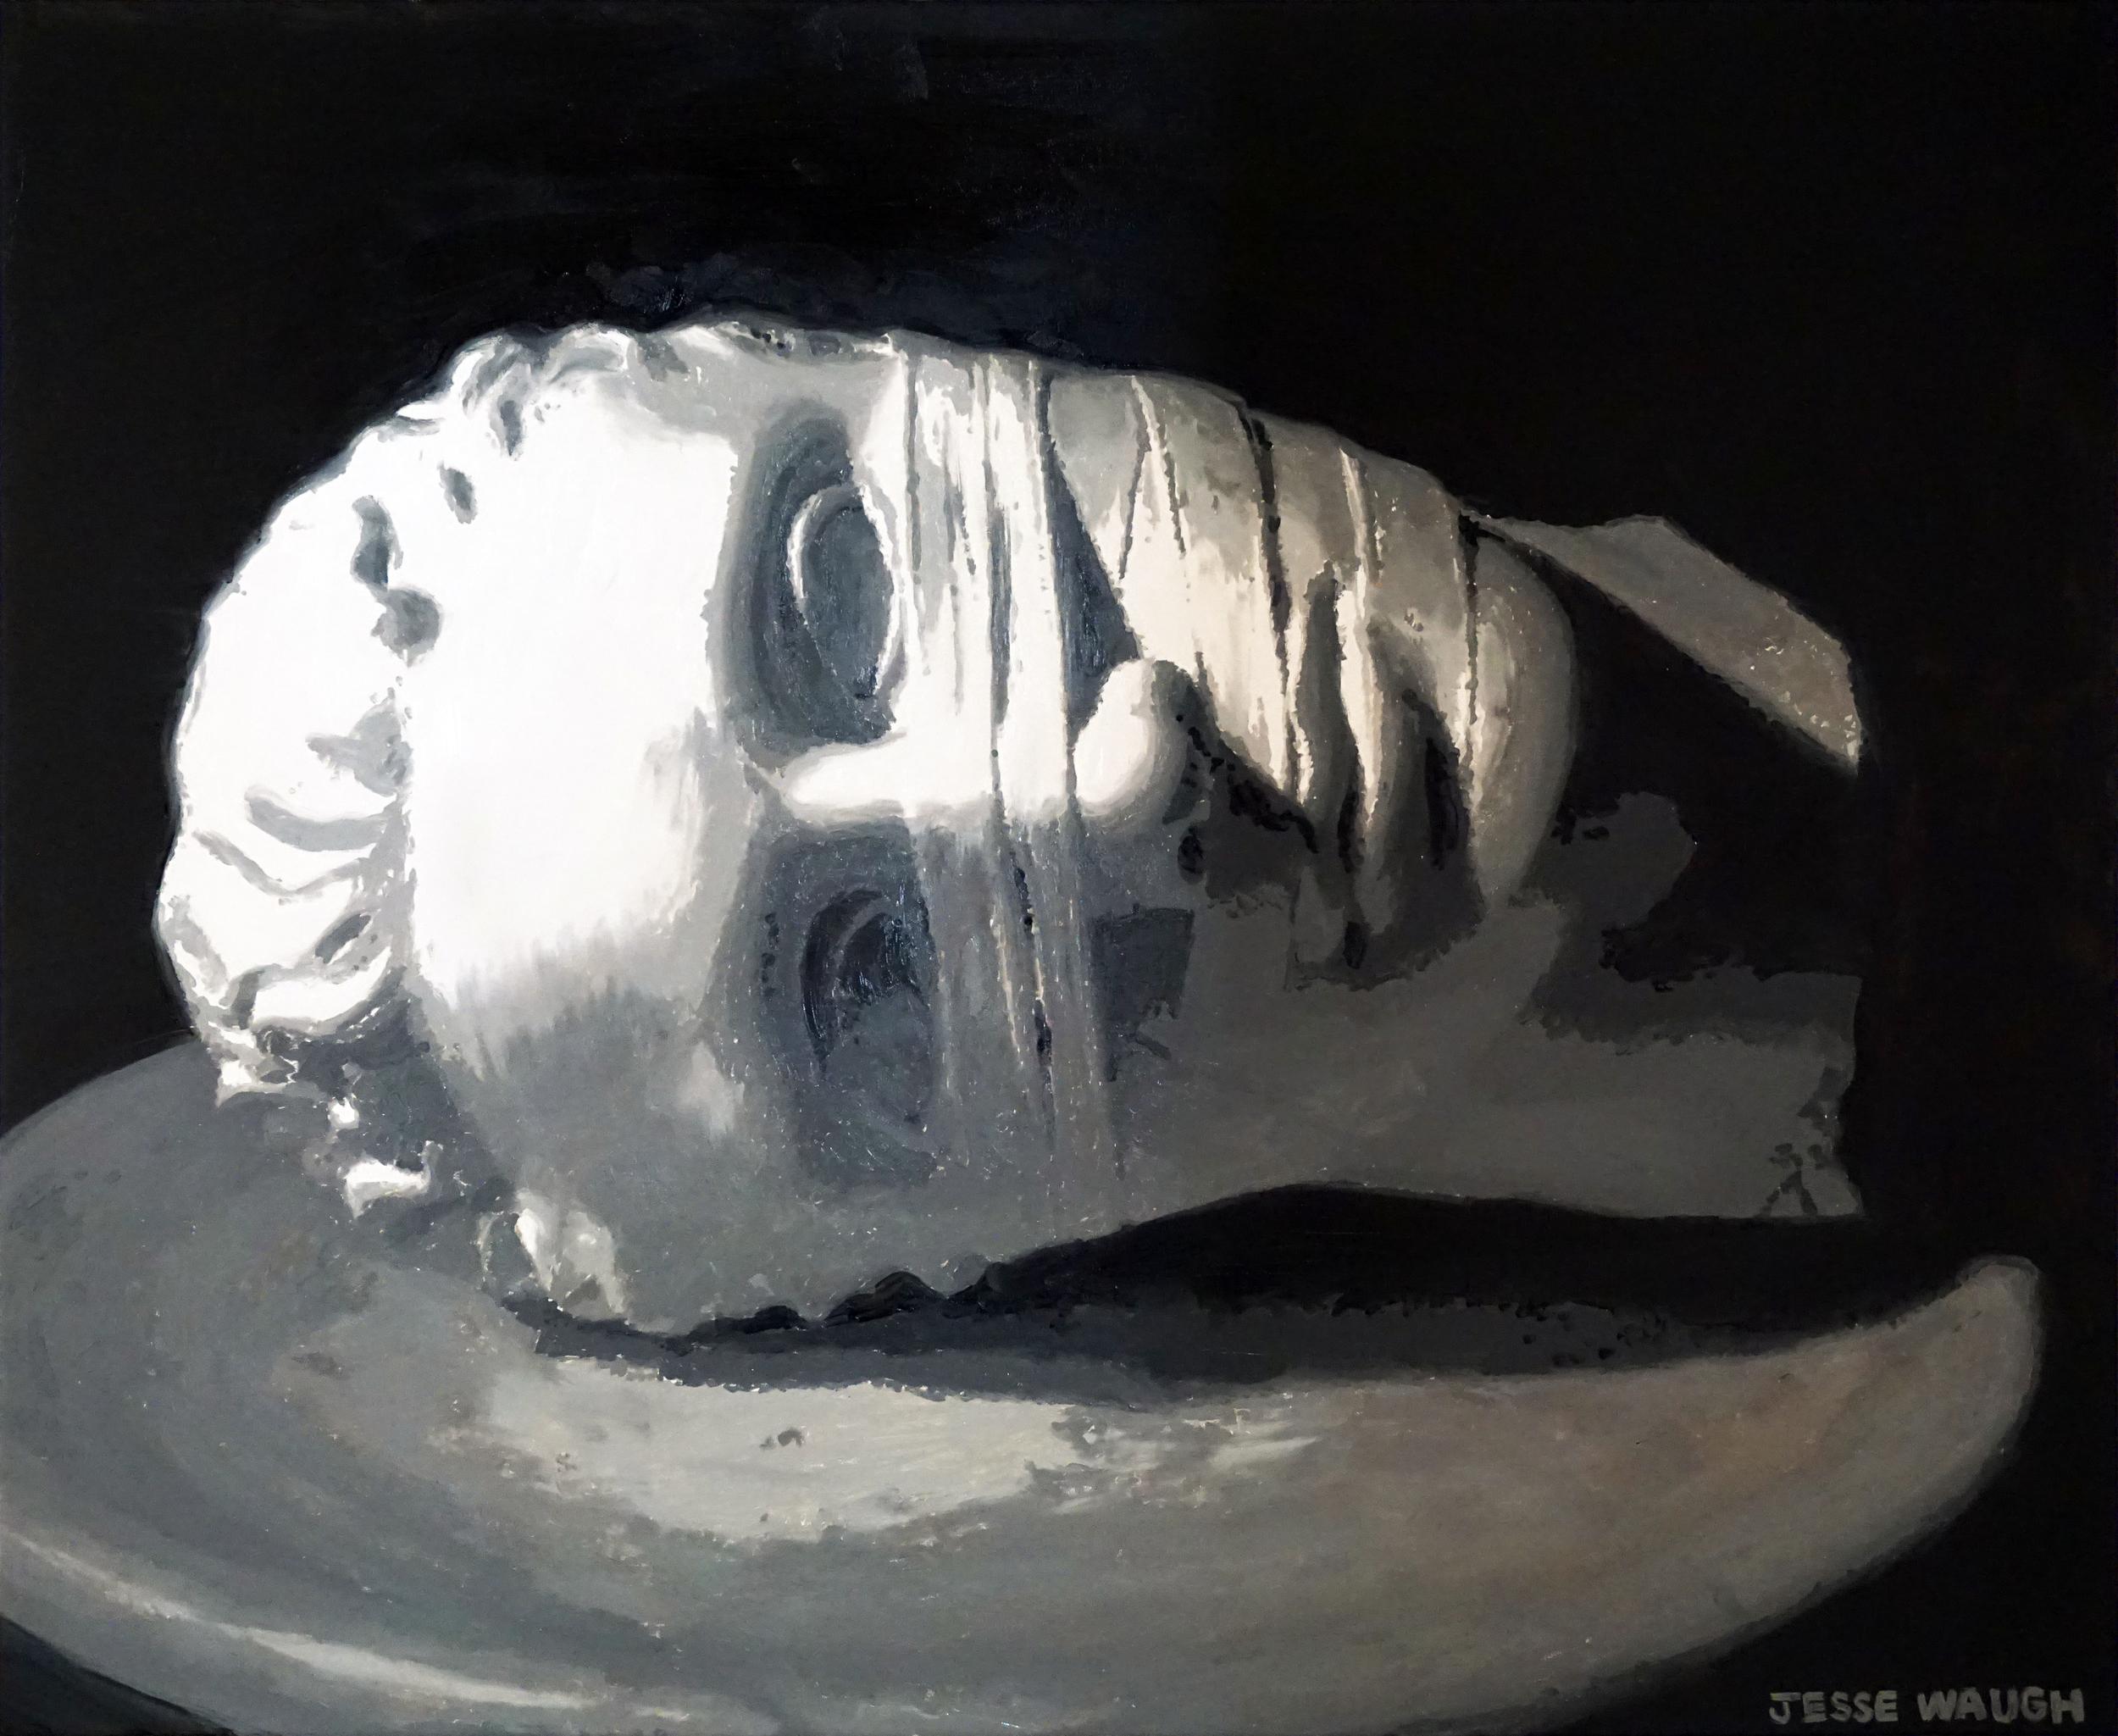 JESSE WAUGH   HEAD OF JOHN THE BAPTIST (AFTER IGOR MITORAJ)   2016 OIL ON CANVAS 73 X 60 CM